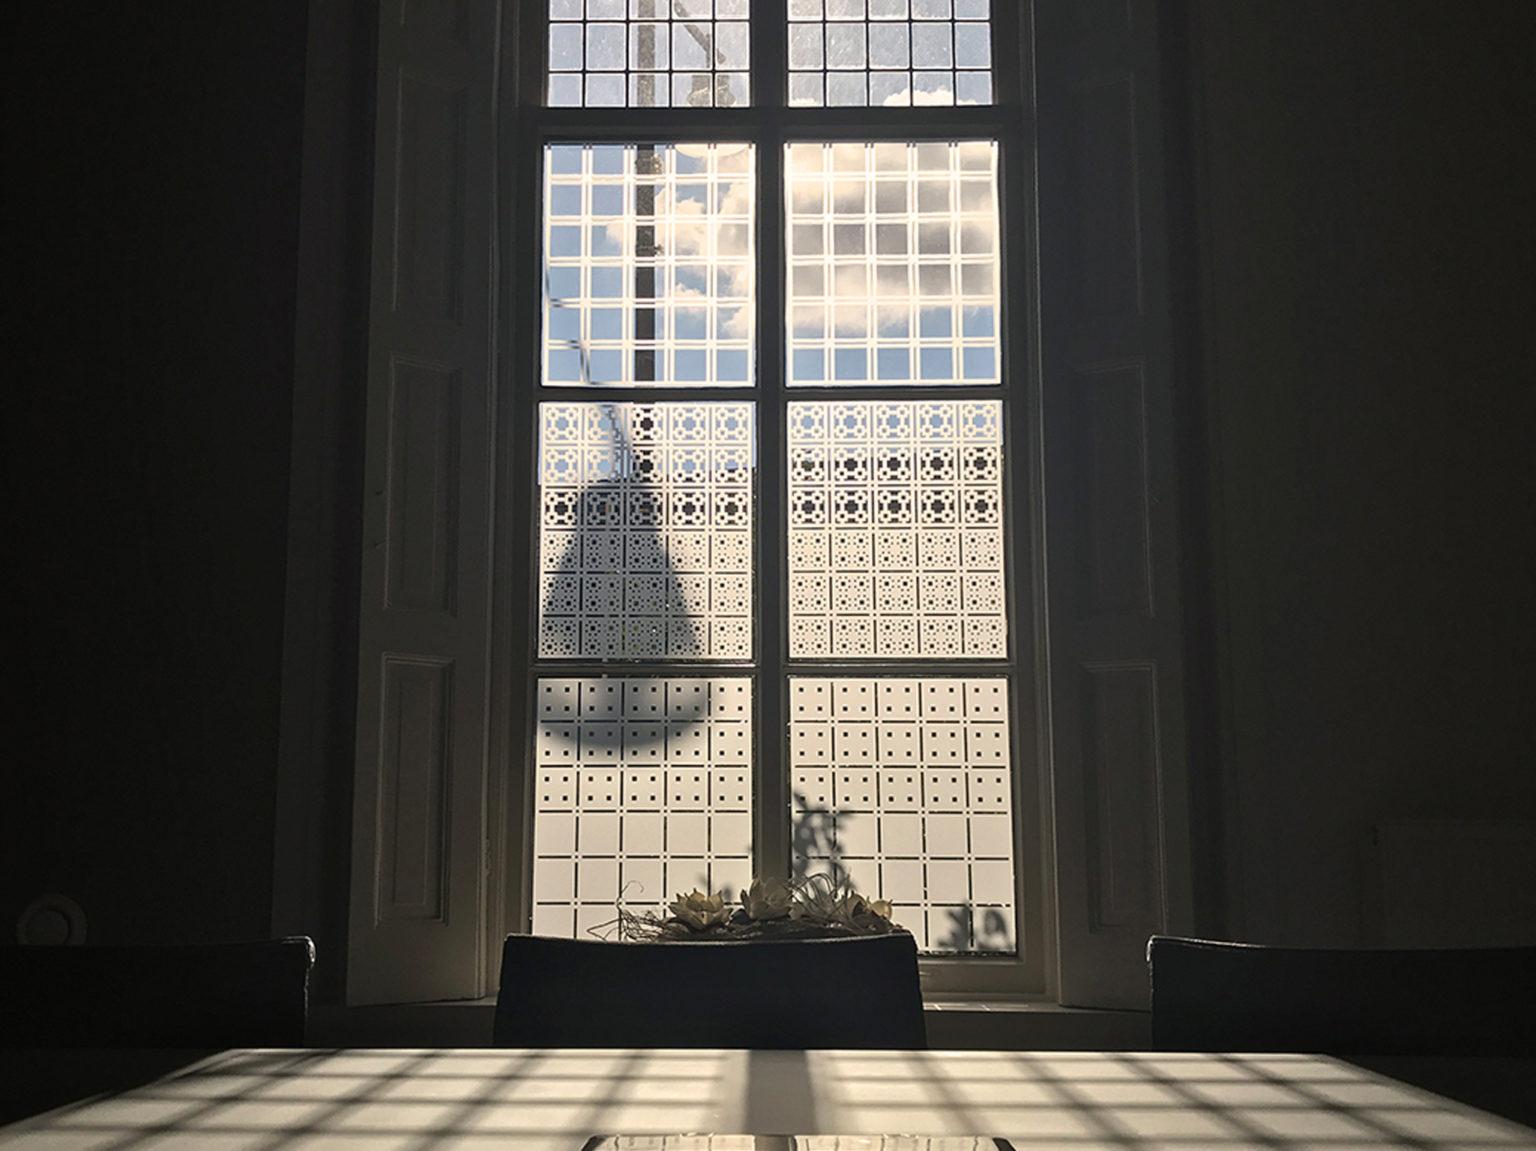 Raamfolie patroon in spreekkamer kantoorvilla